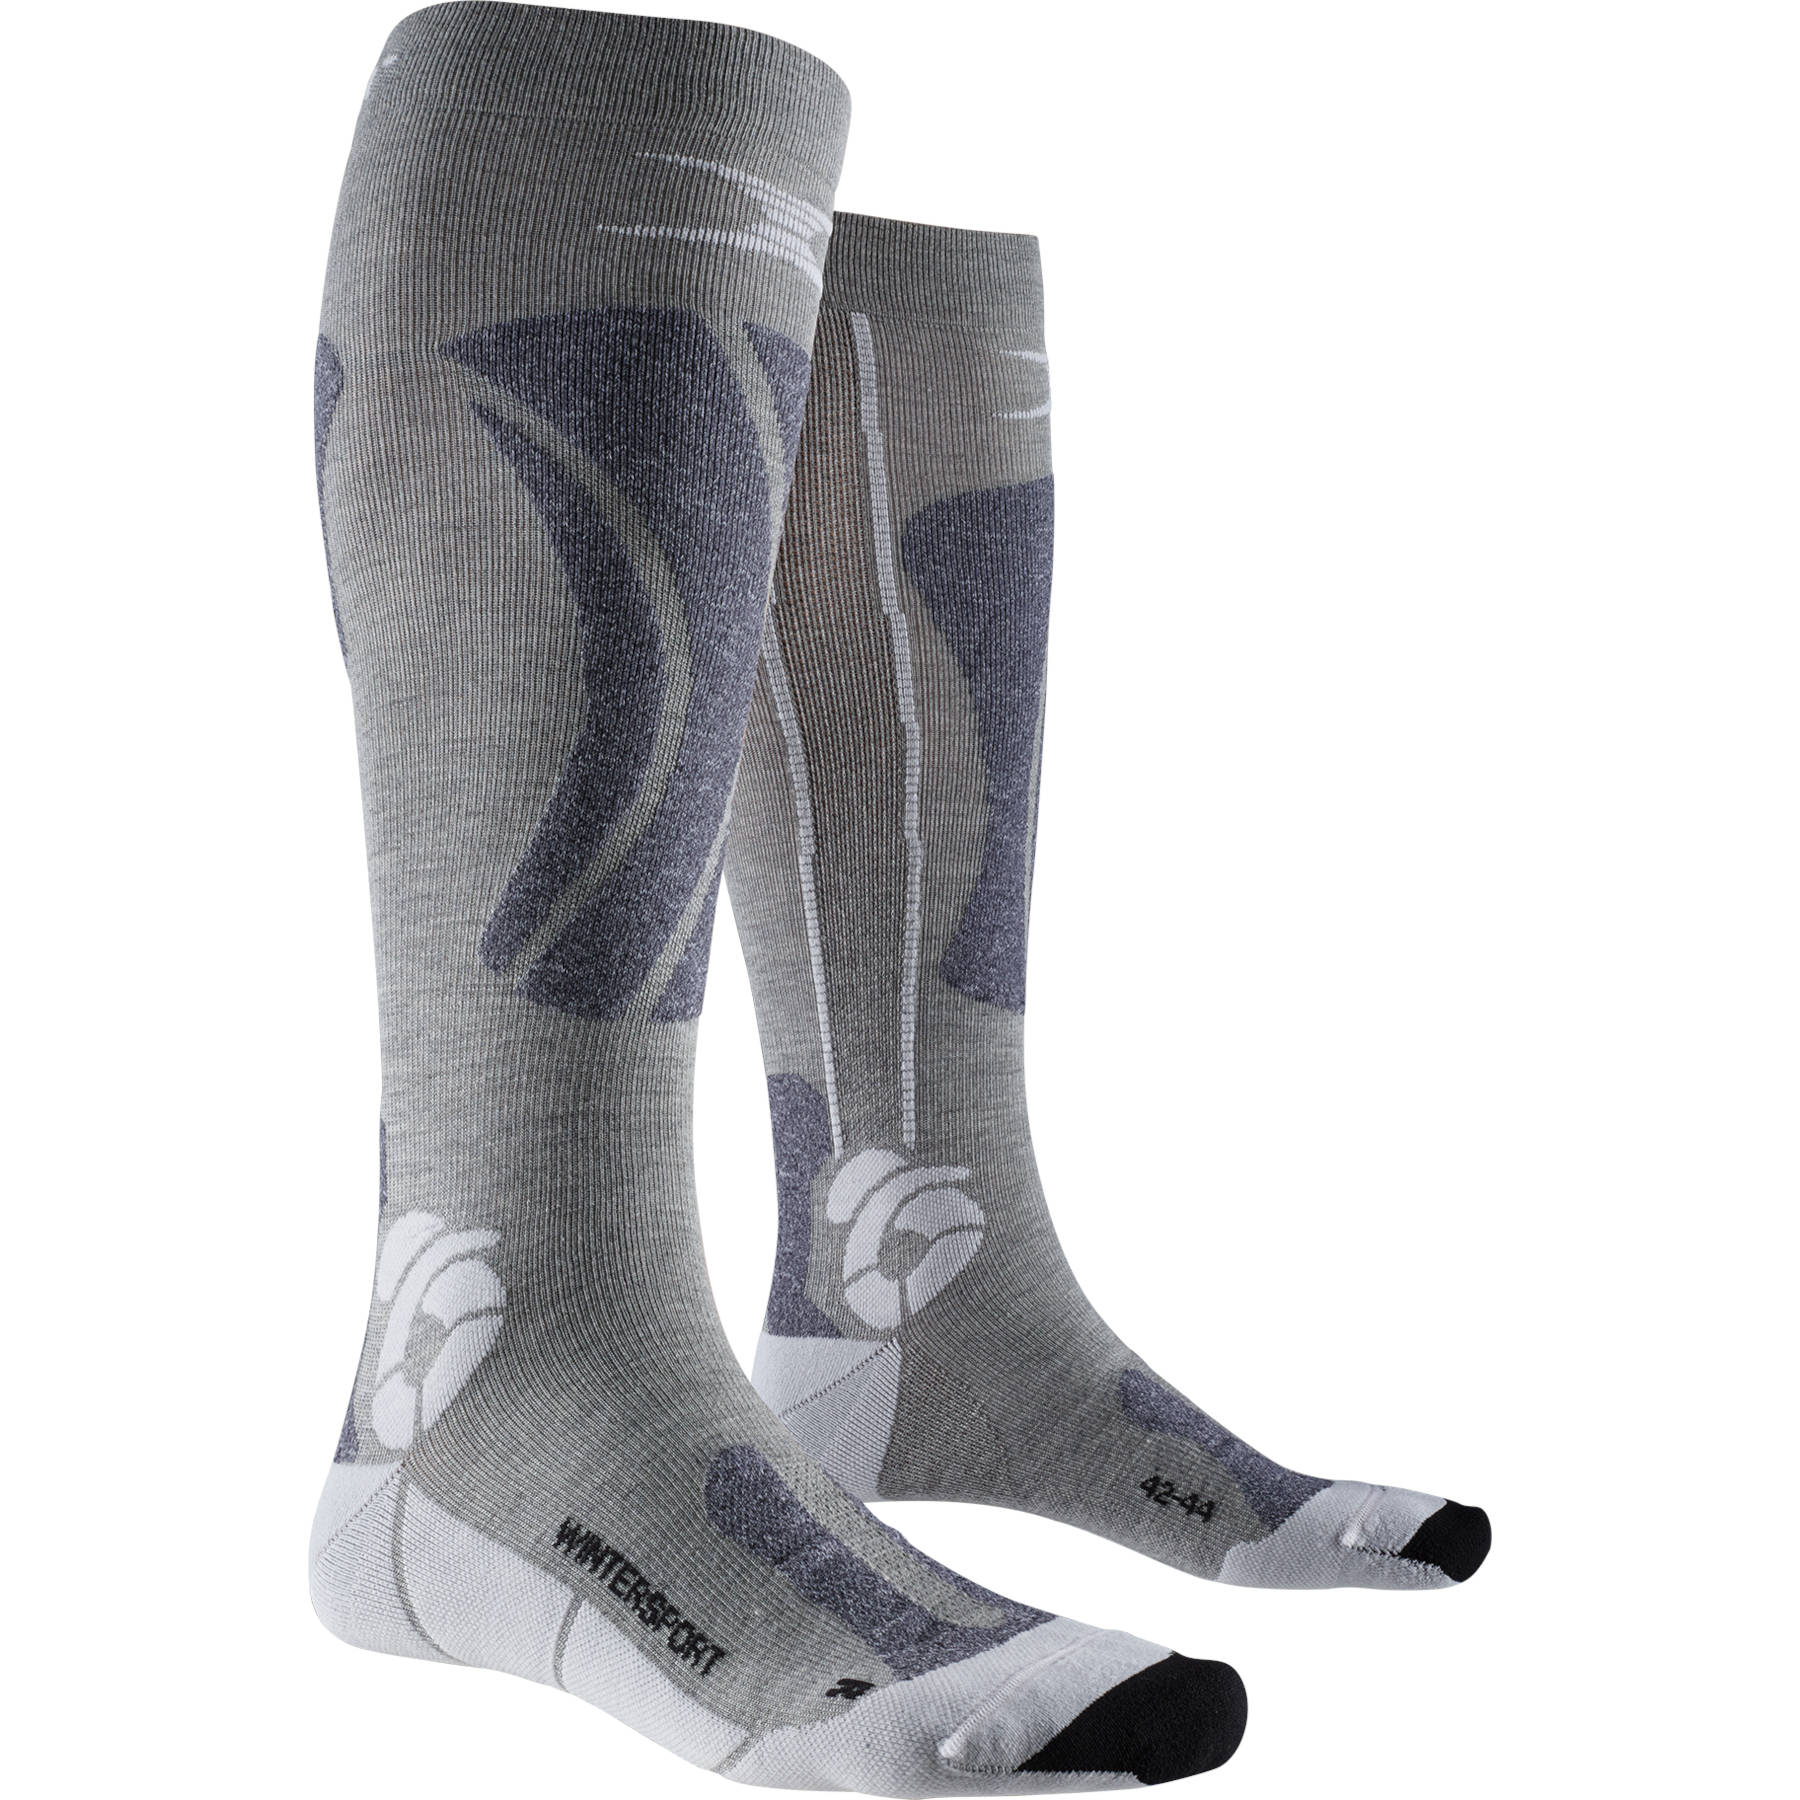 Image of X-Socks Apani Wintersports Socks for Men - black/grey/white